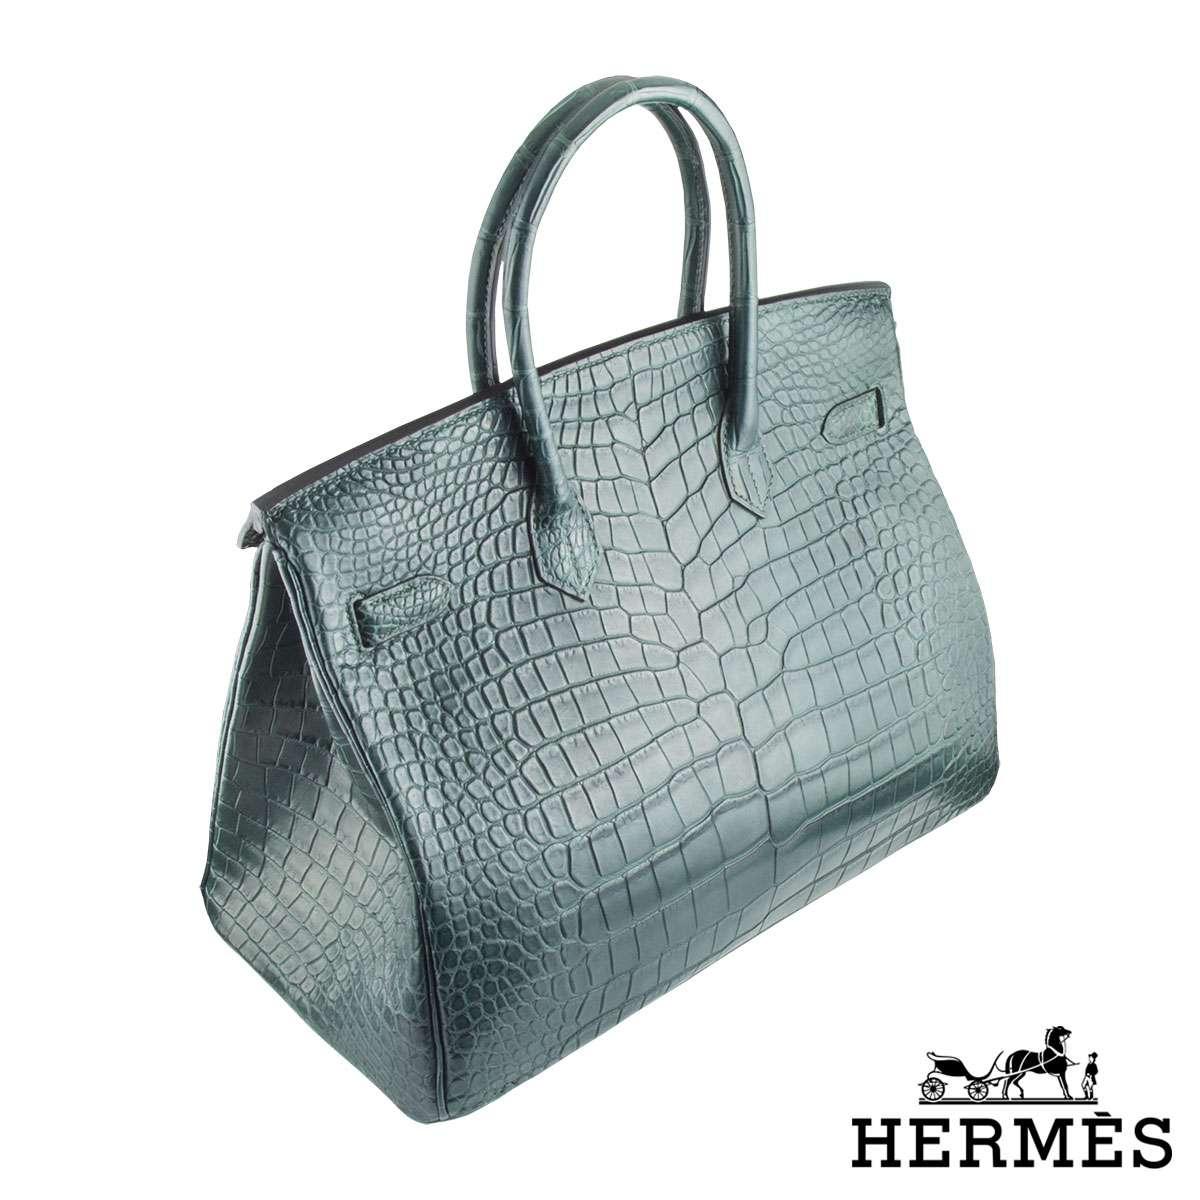 ... Hermès Porosus Crocodile 35cm Birkin Bag ... 6e5f8413b86cf